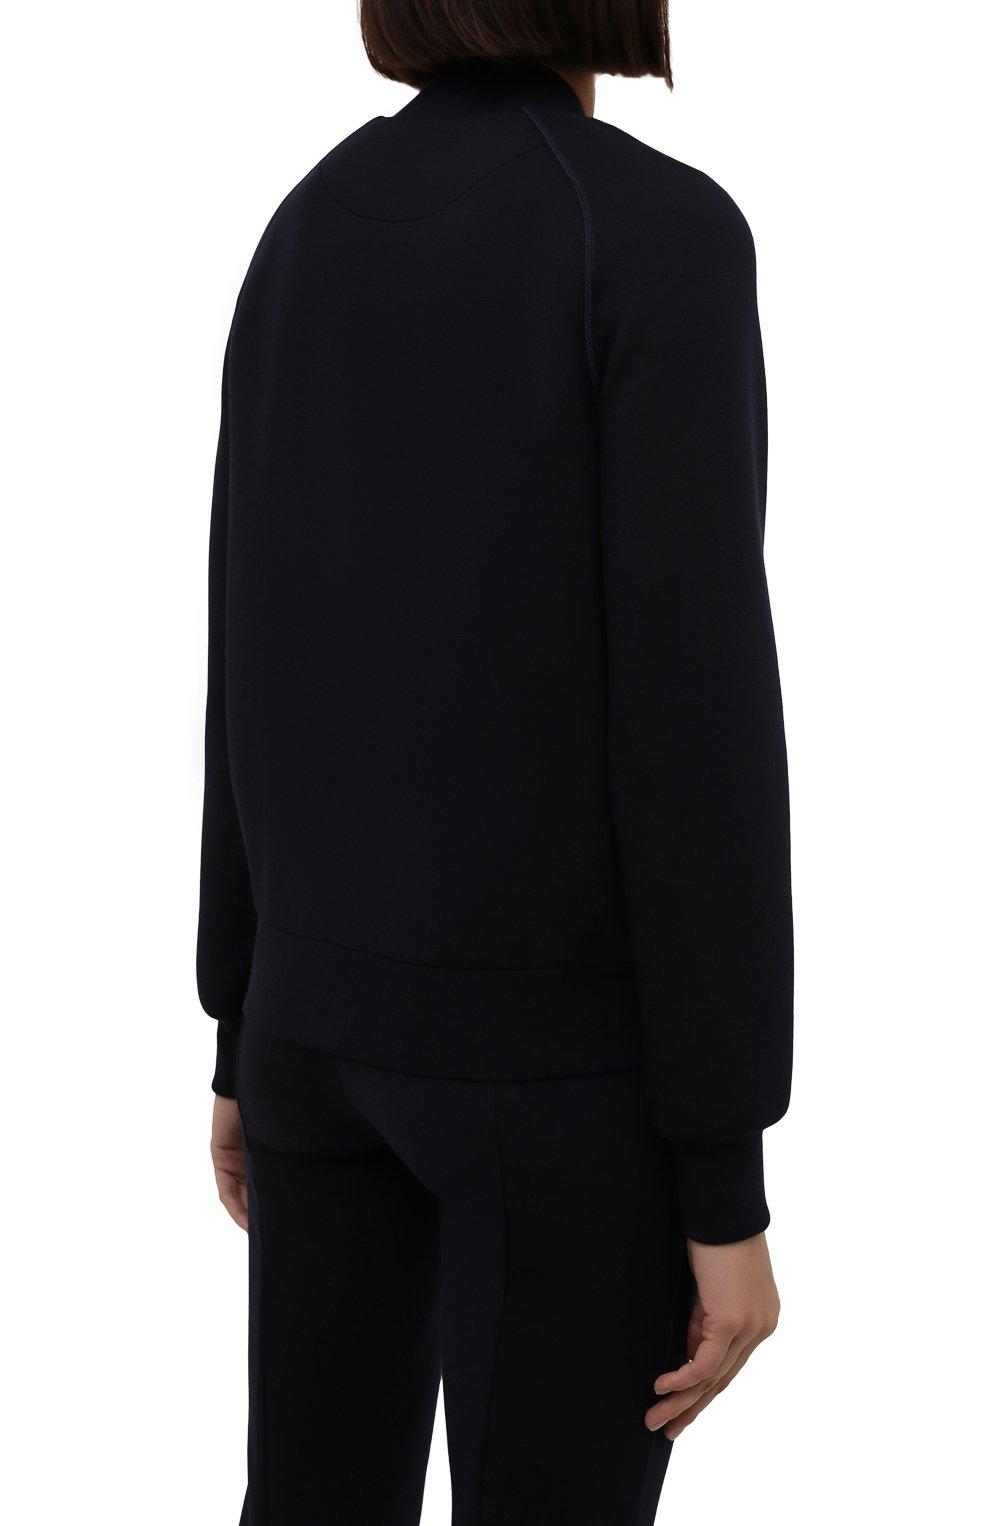 Женский кардиган из шерсти и вискозы GIORGIO ARMANI темно-синего цвета, арт. 6KAB50/AJDFZ | Фото 4